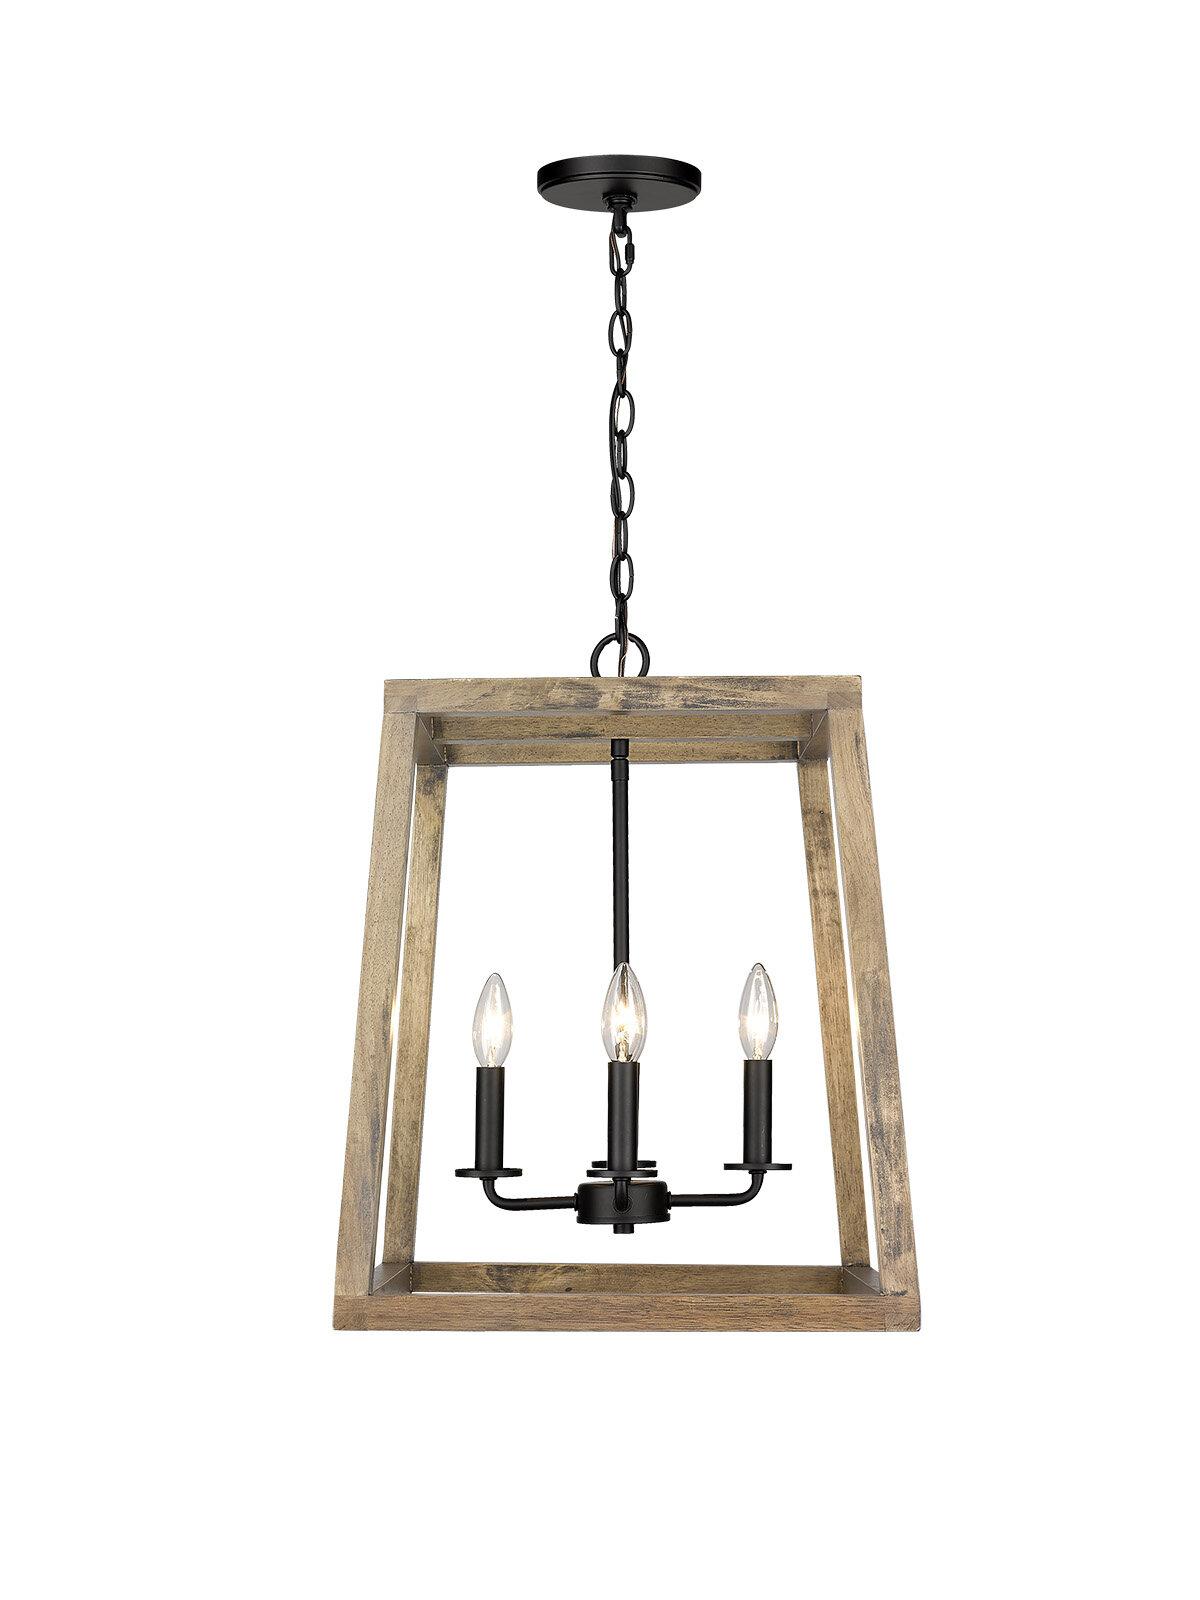 Gracie Oaks Madina 4 Light Lantern Geometric Pendant With Wood Accents Wayfair